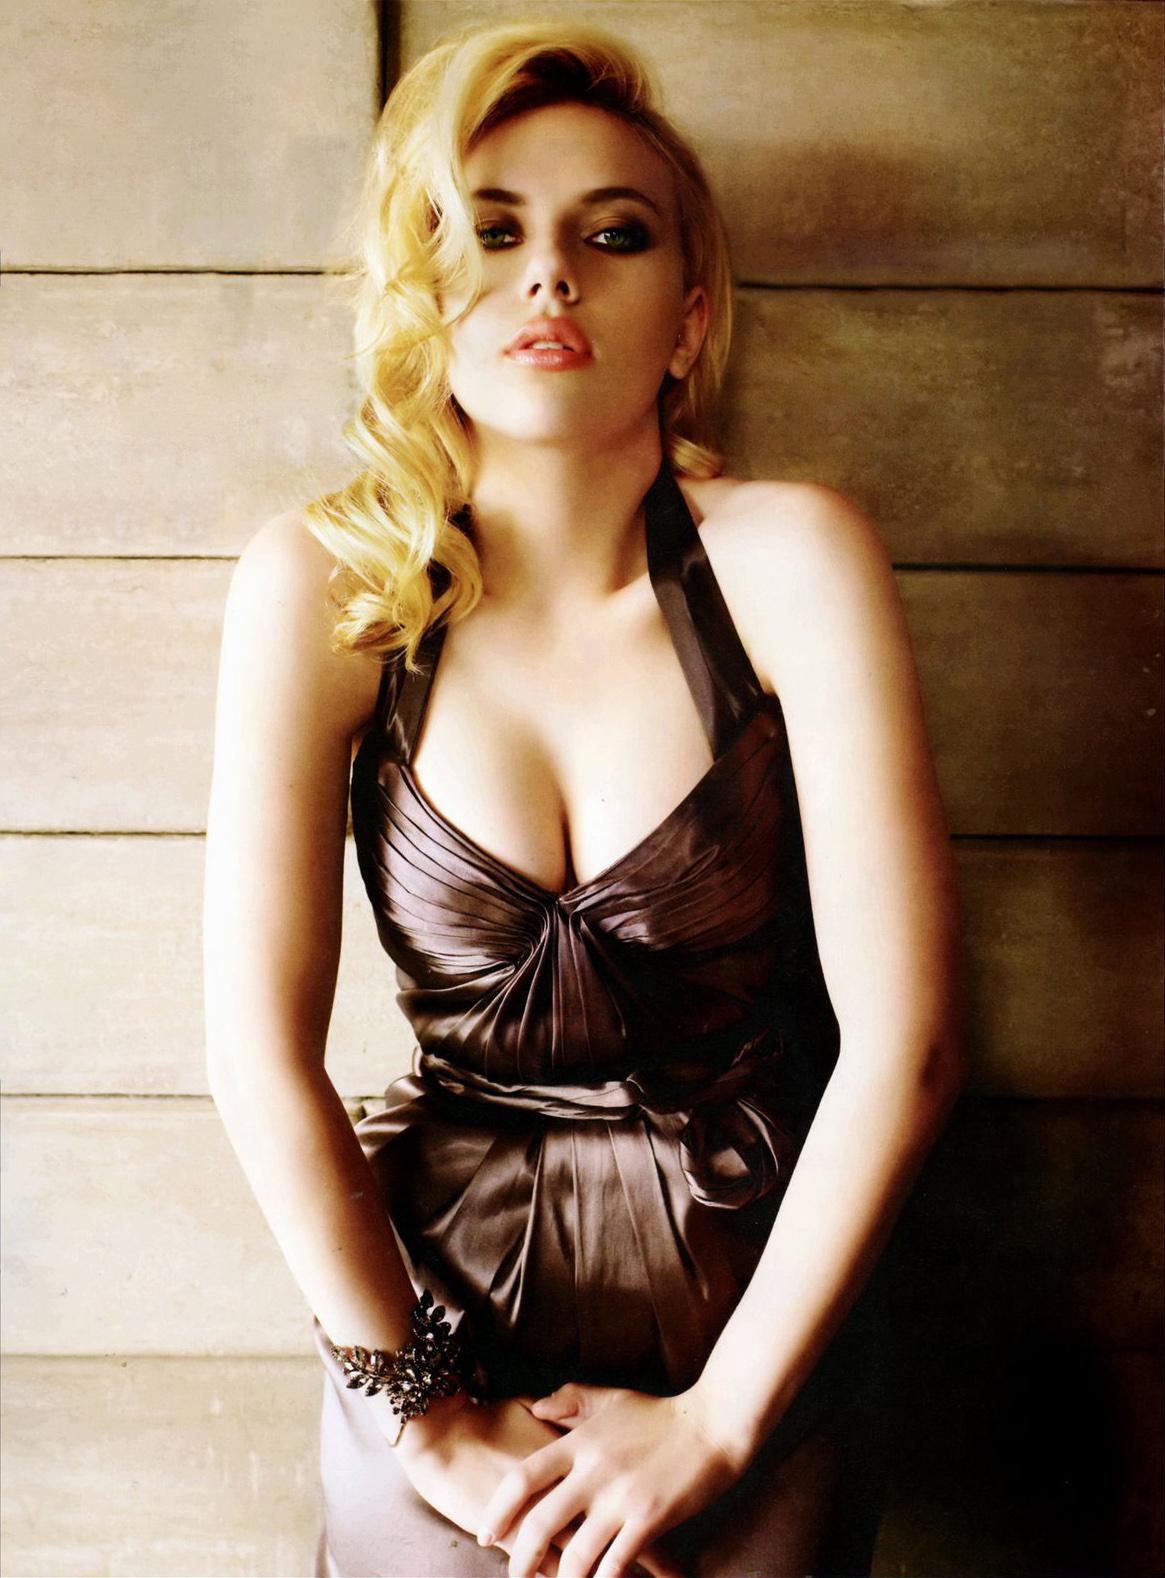 http://2.bp.blogspot.com/-tZEFtleDqYQ/UP6kD4plwGI/AAAAAAAAUCg/jjD5RVrSBds/s1600/scarlett-johansson-cleavage-inny-02.jpg